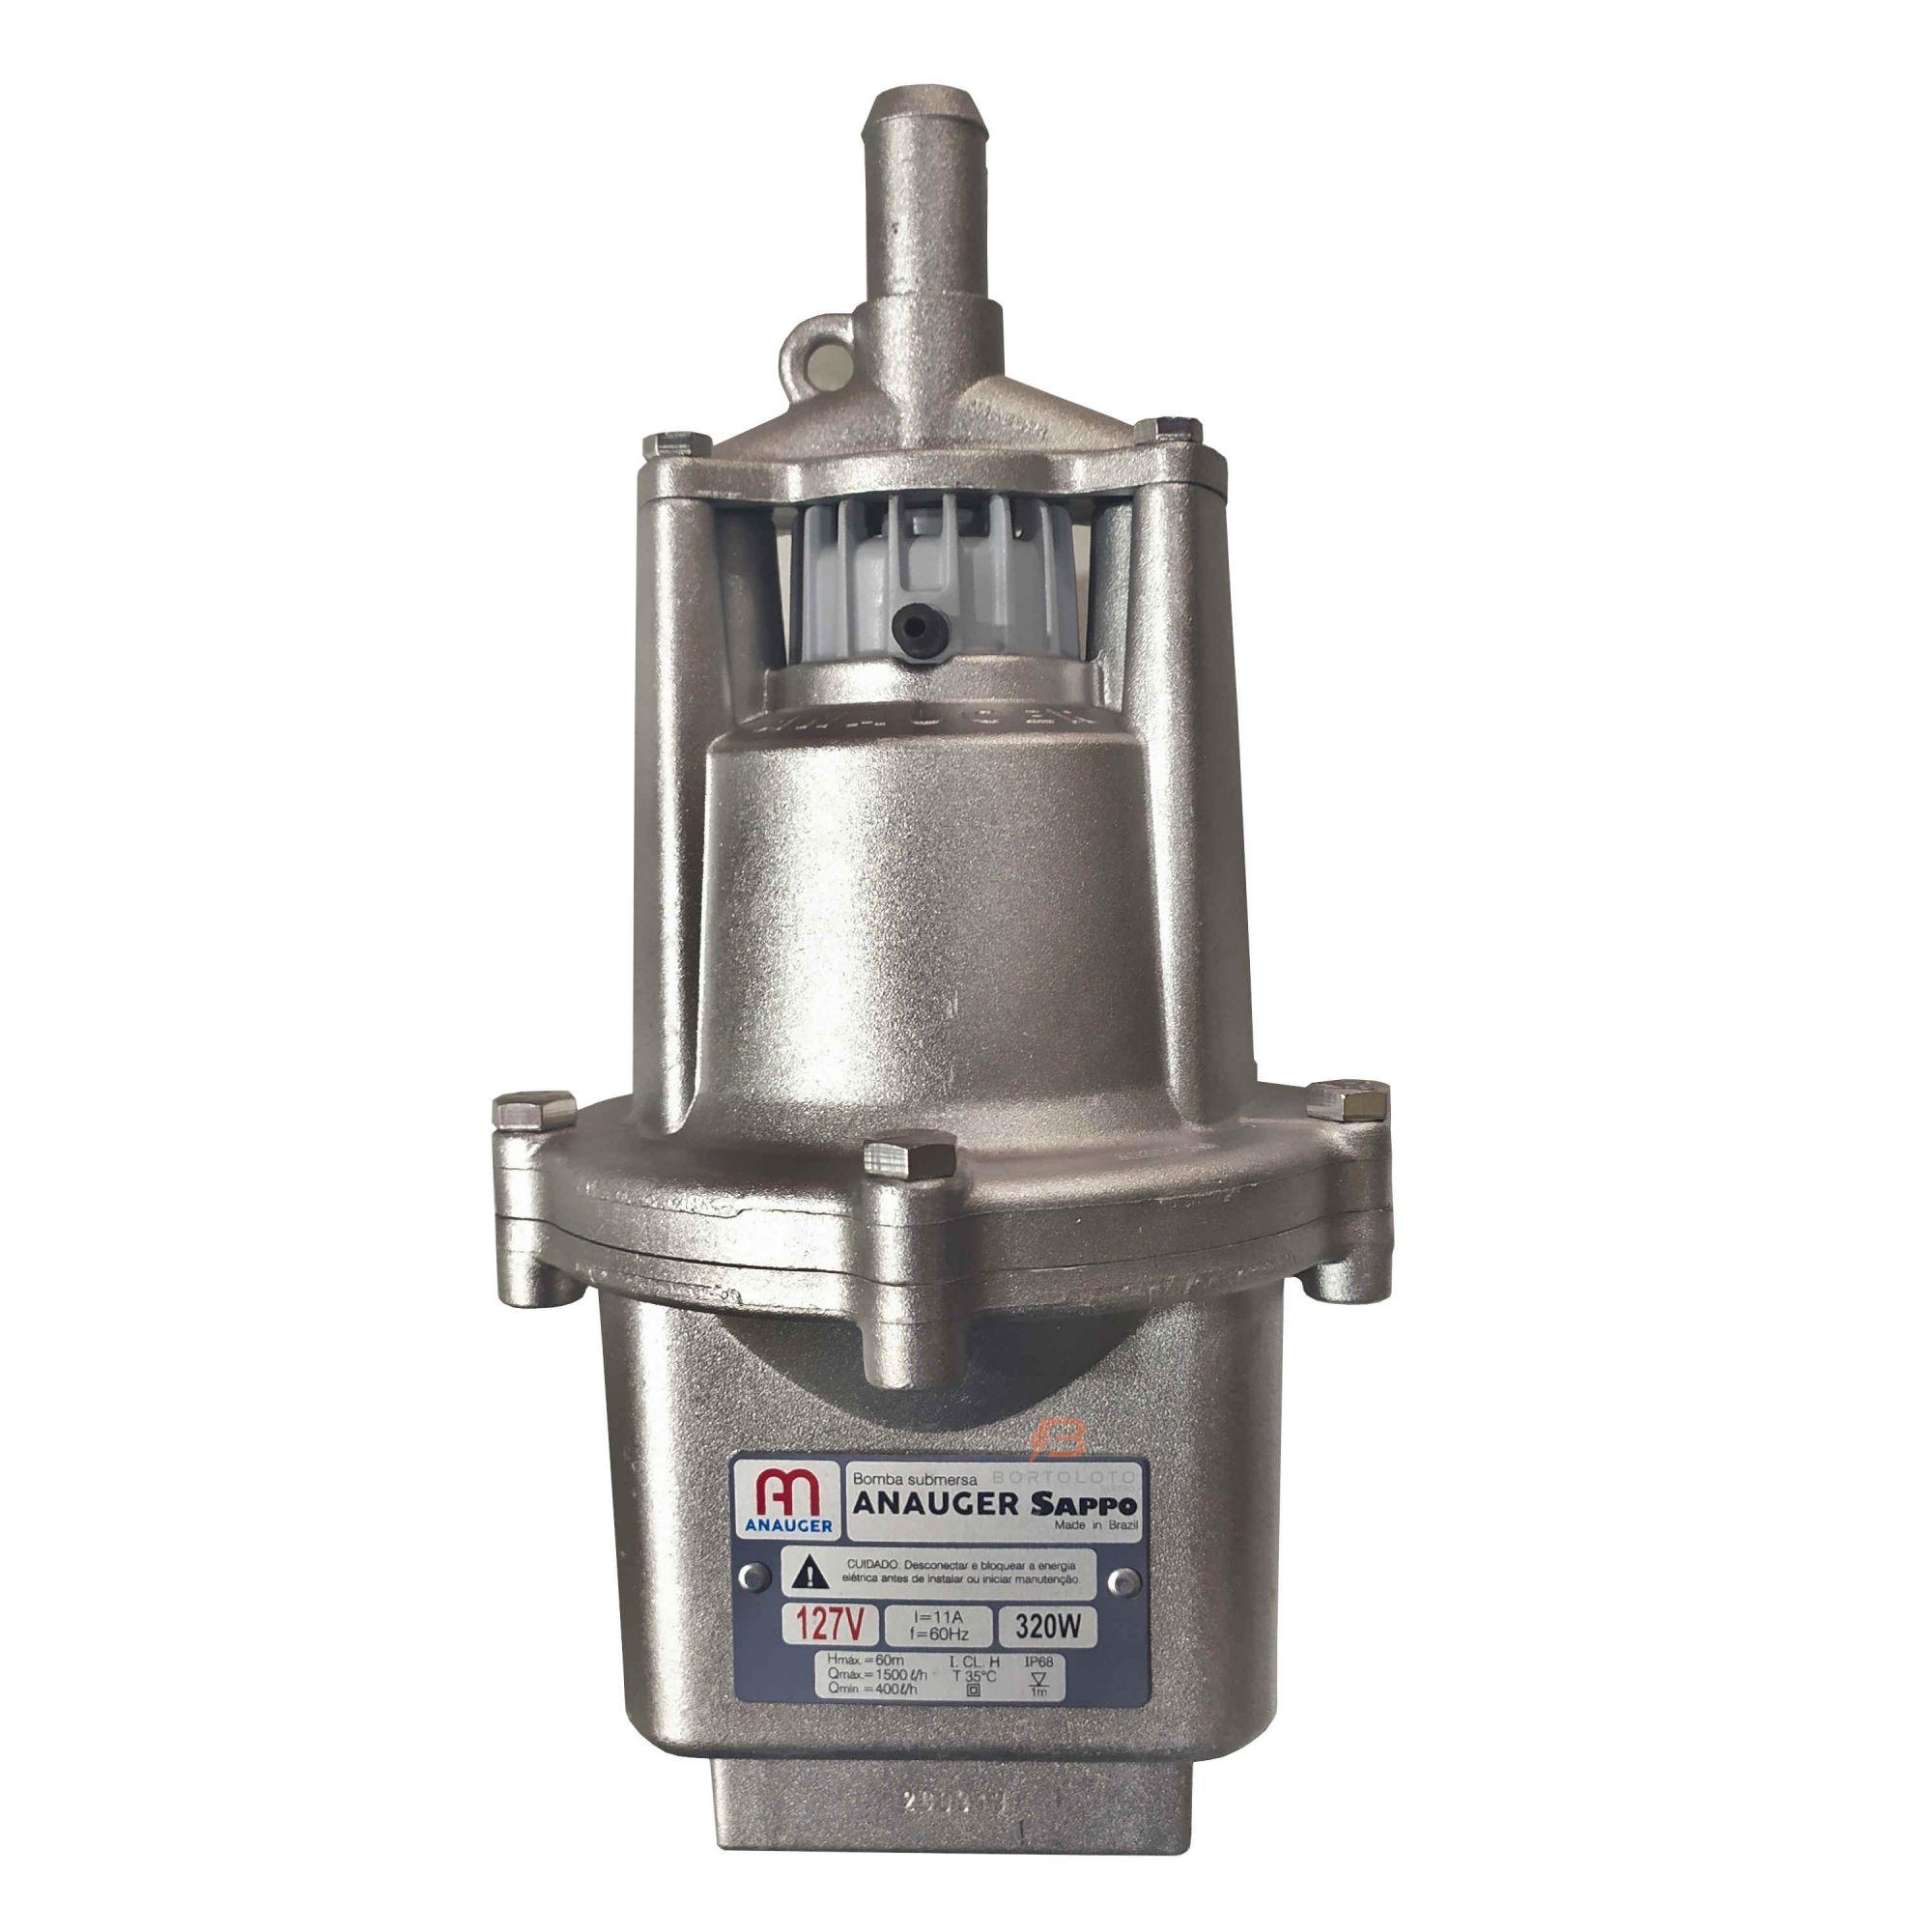 Bomba Submersa Vibratória Para Poço Anauger Sappo 5G Monofásica 110V